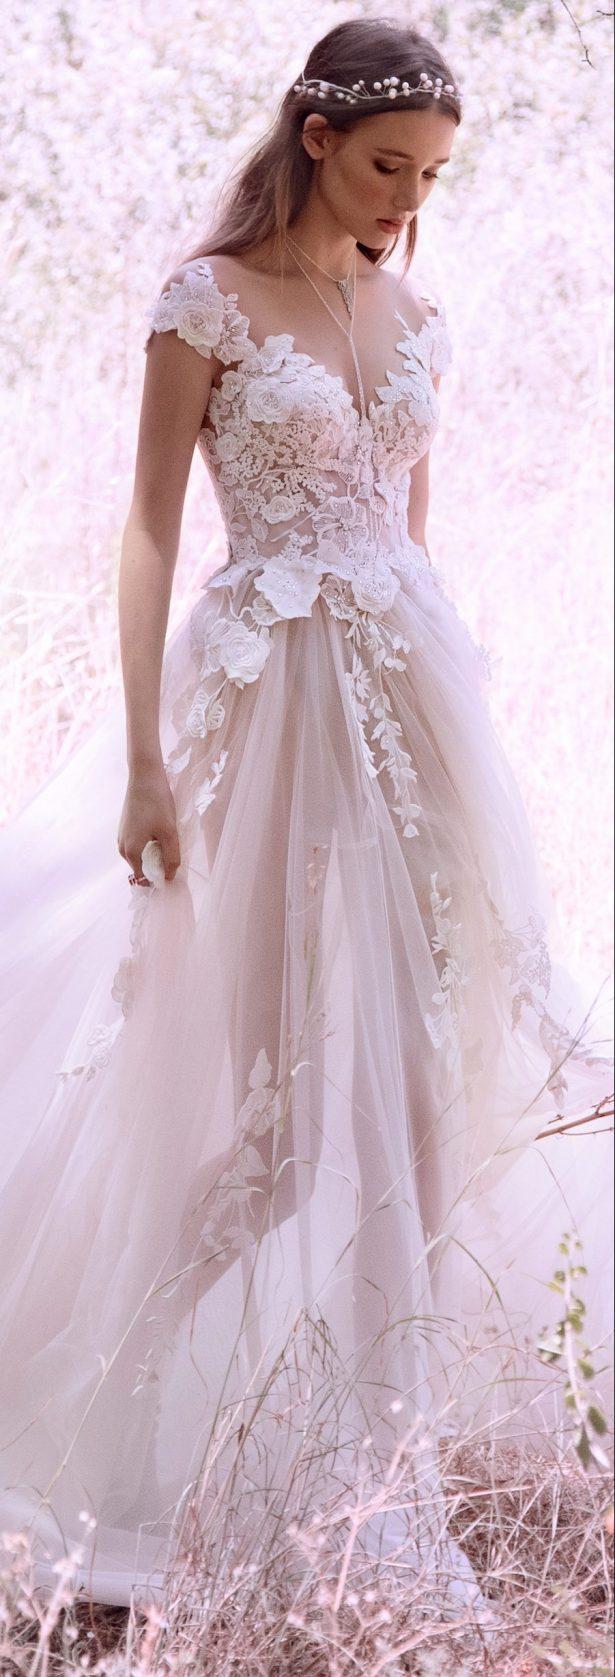 gala-collection-no-iv-by-galia-lahav-wedding-dresses-902_front-e1500675421237-615x1677